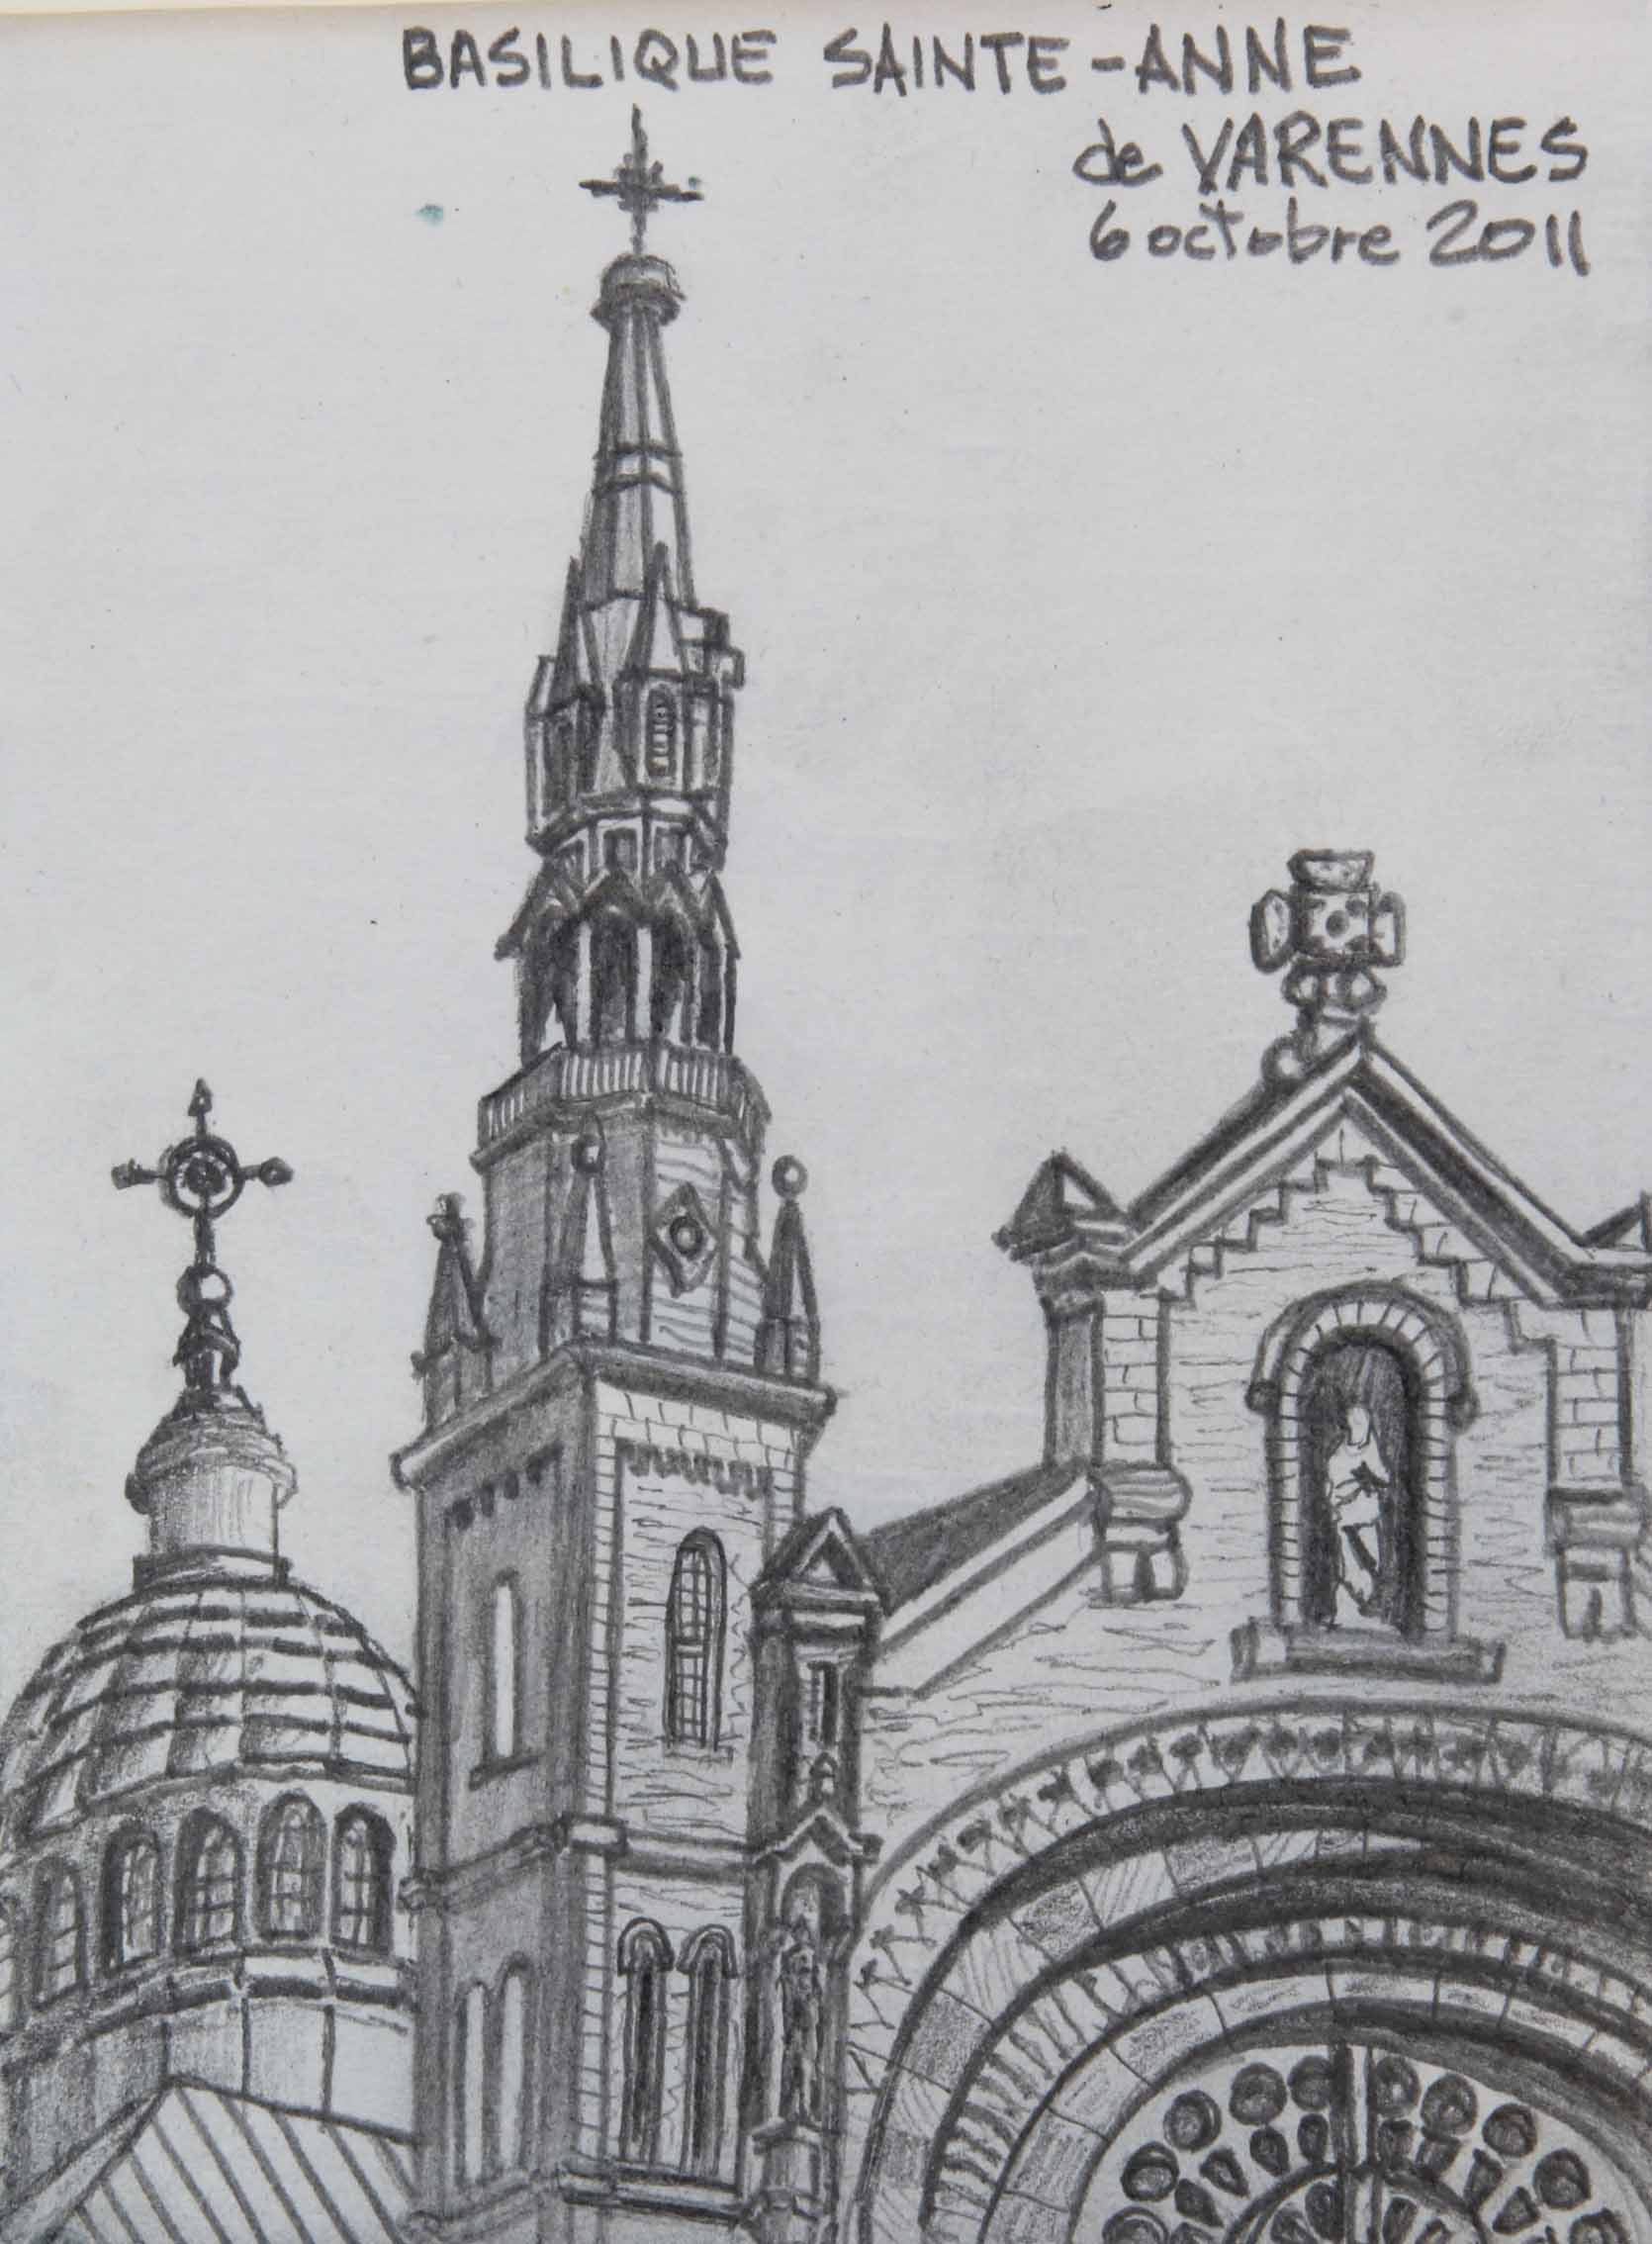 D11 Basilique Ste-Anne_Varennes